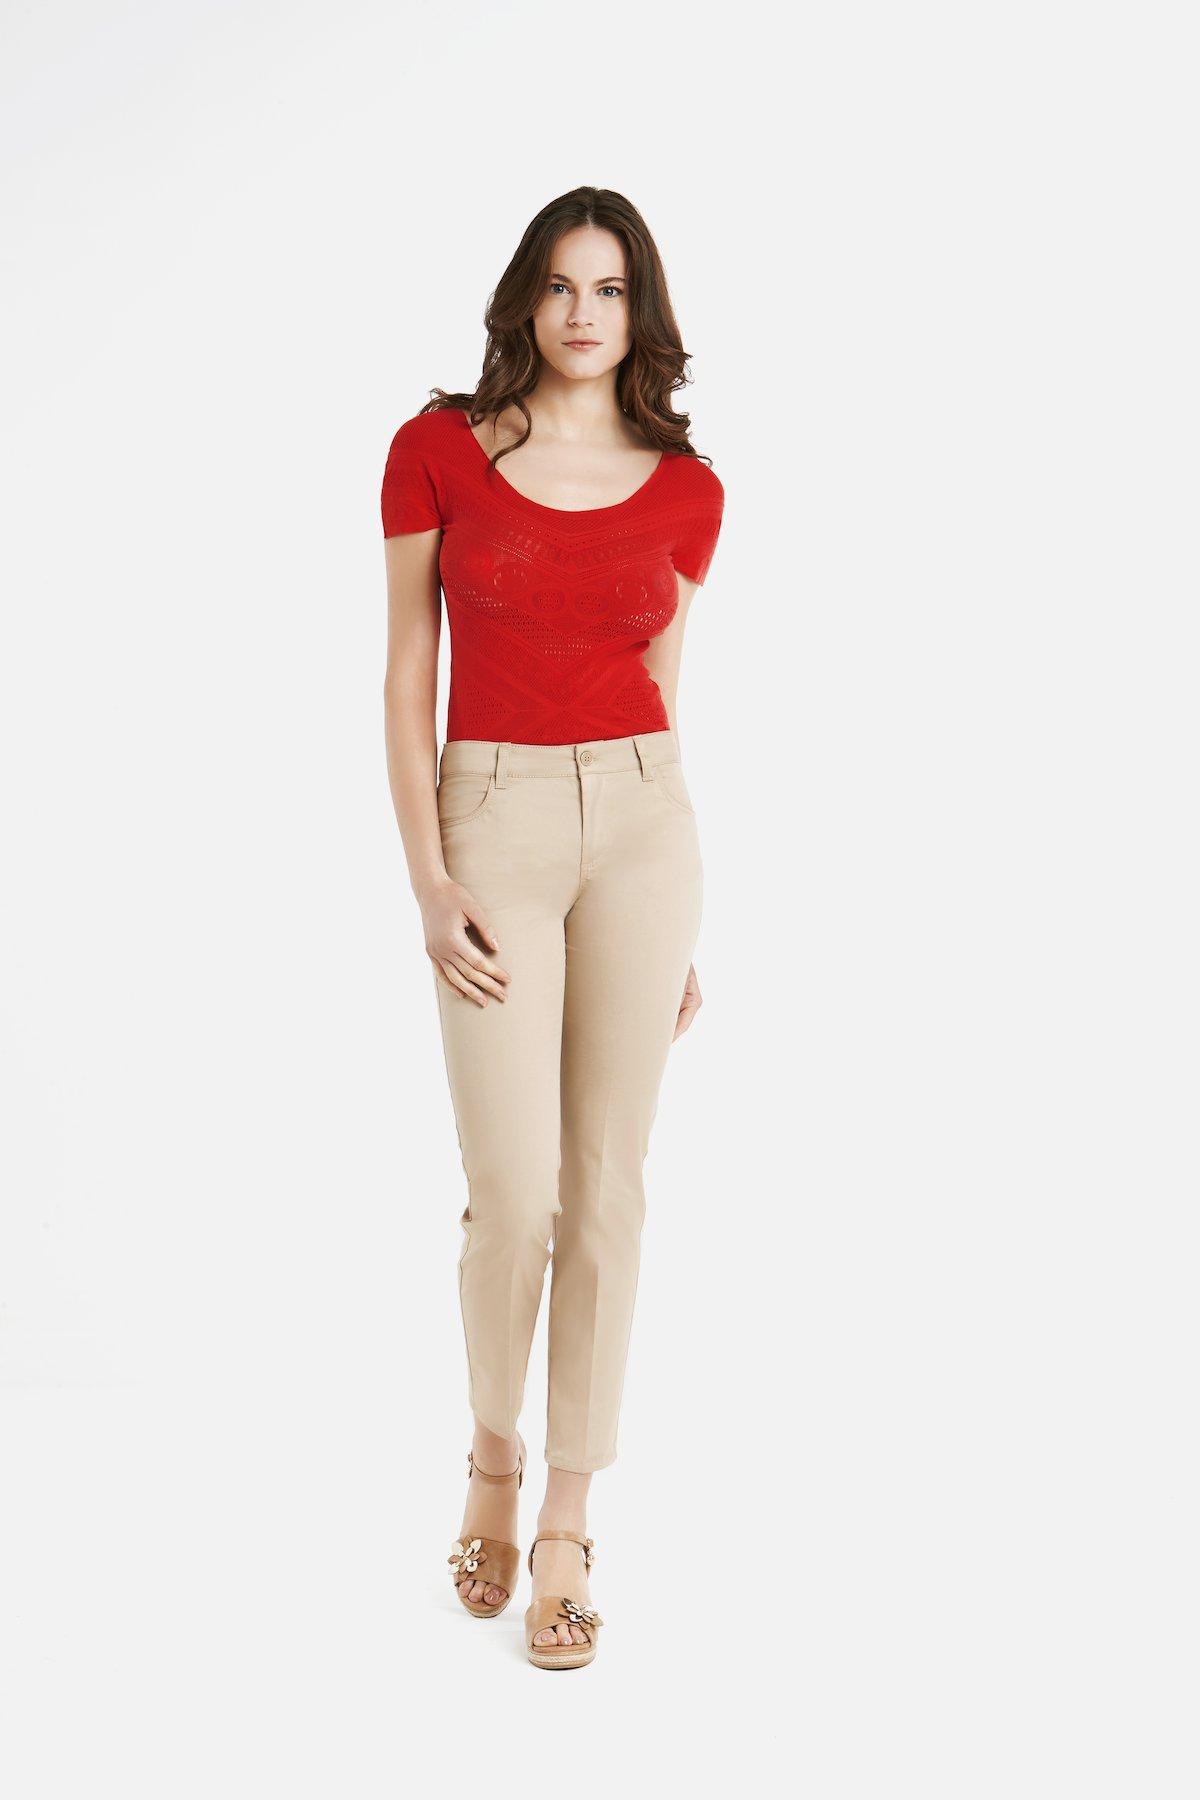 Pantaloni Kate 5 tasche a gamba stretta e corta